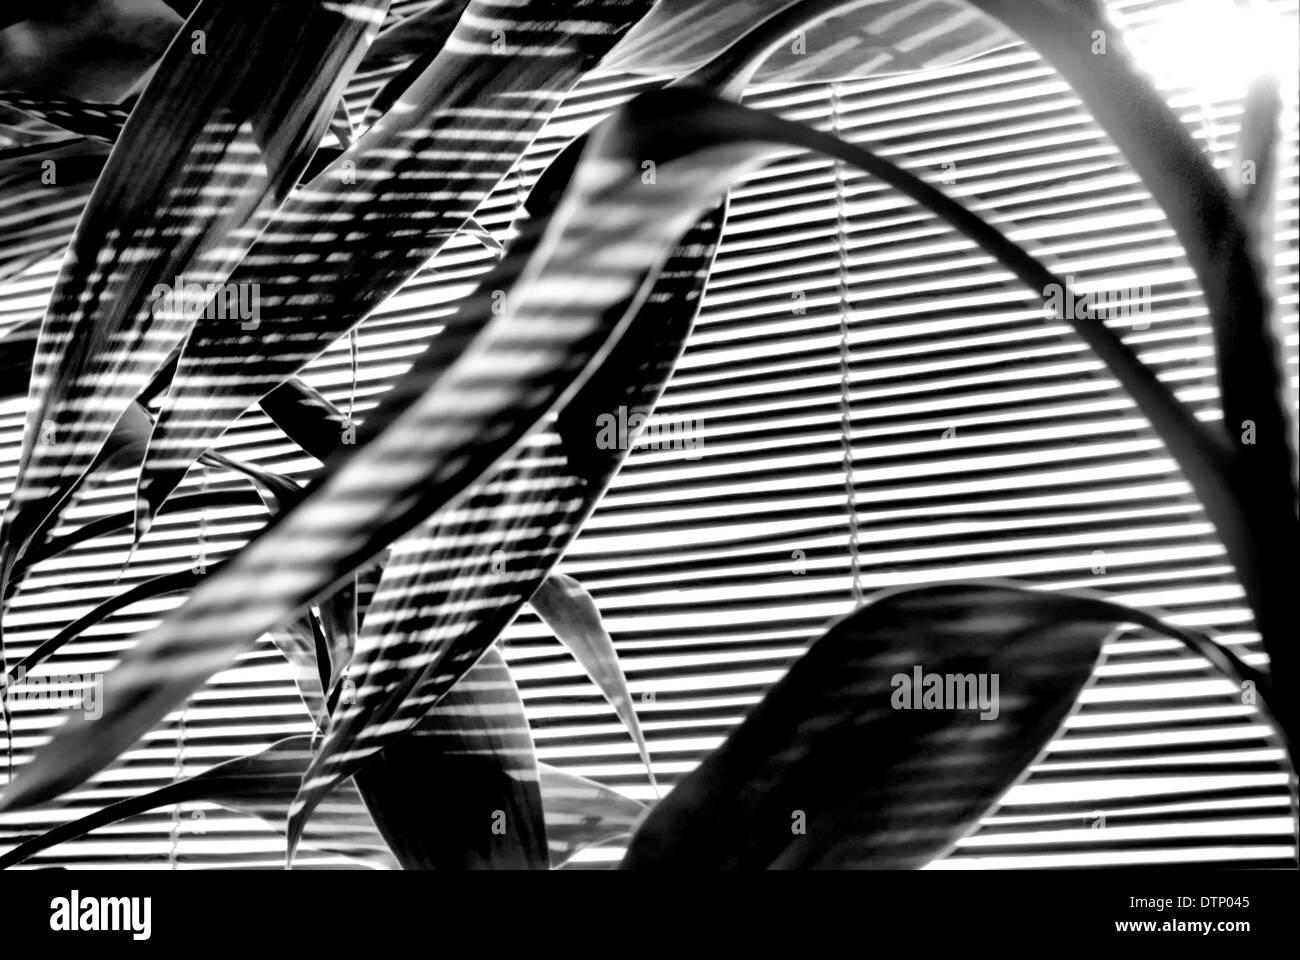 Shadow and Light - Stock Image